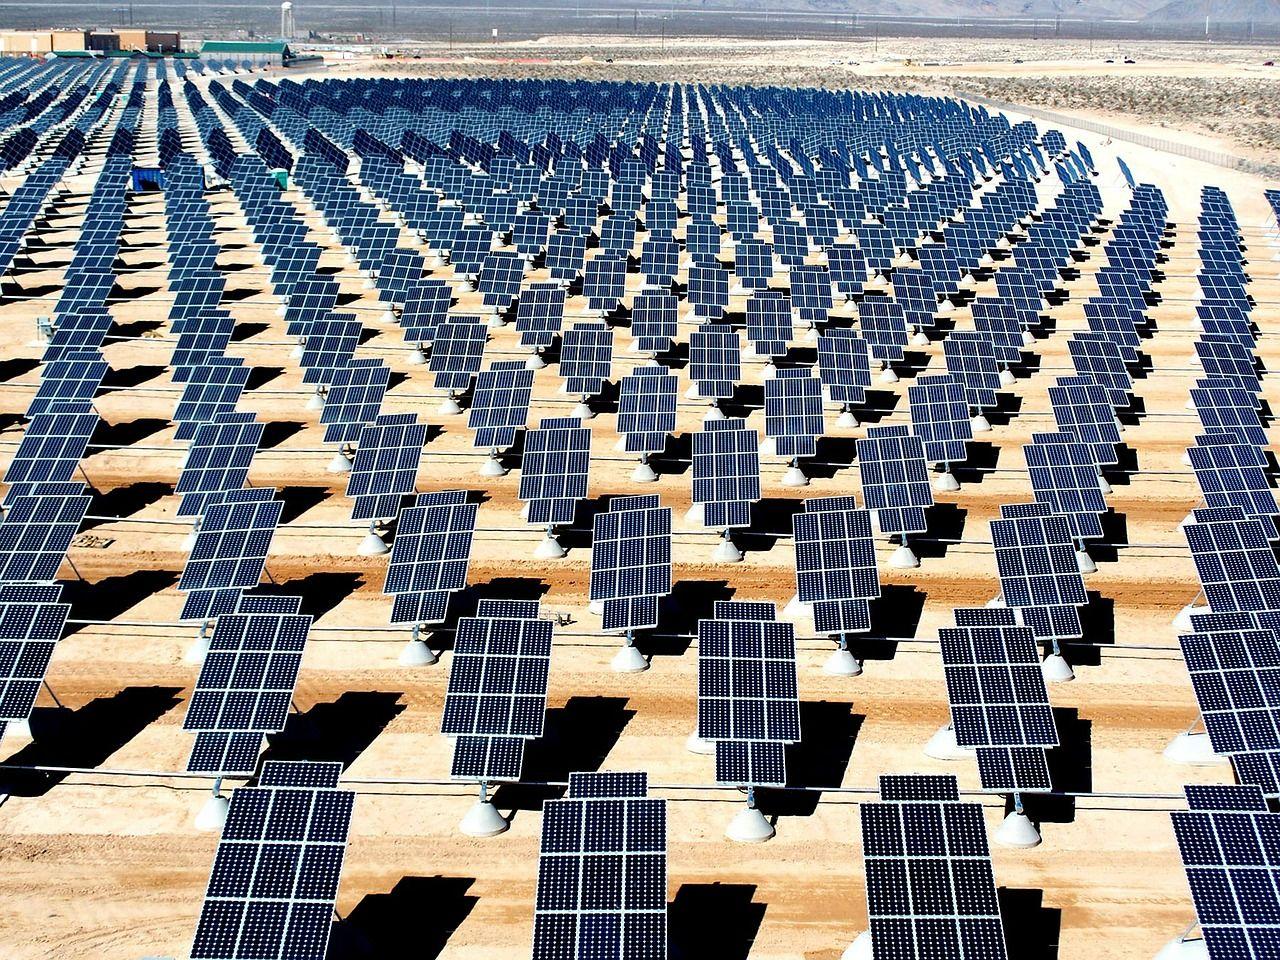 1564646793 20190731 aleasoft planta fotovoltaica arreglo paneles solares